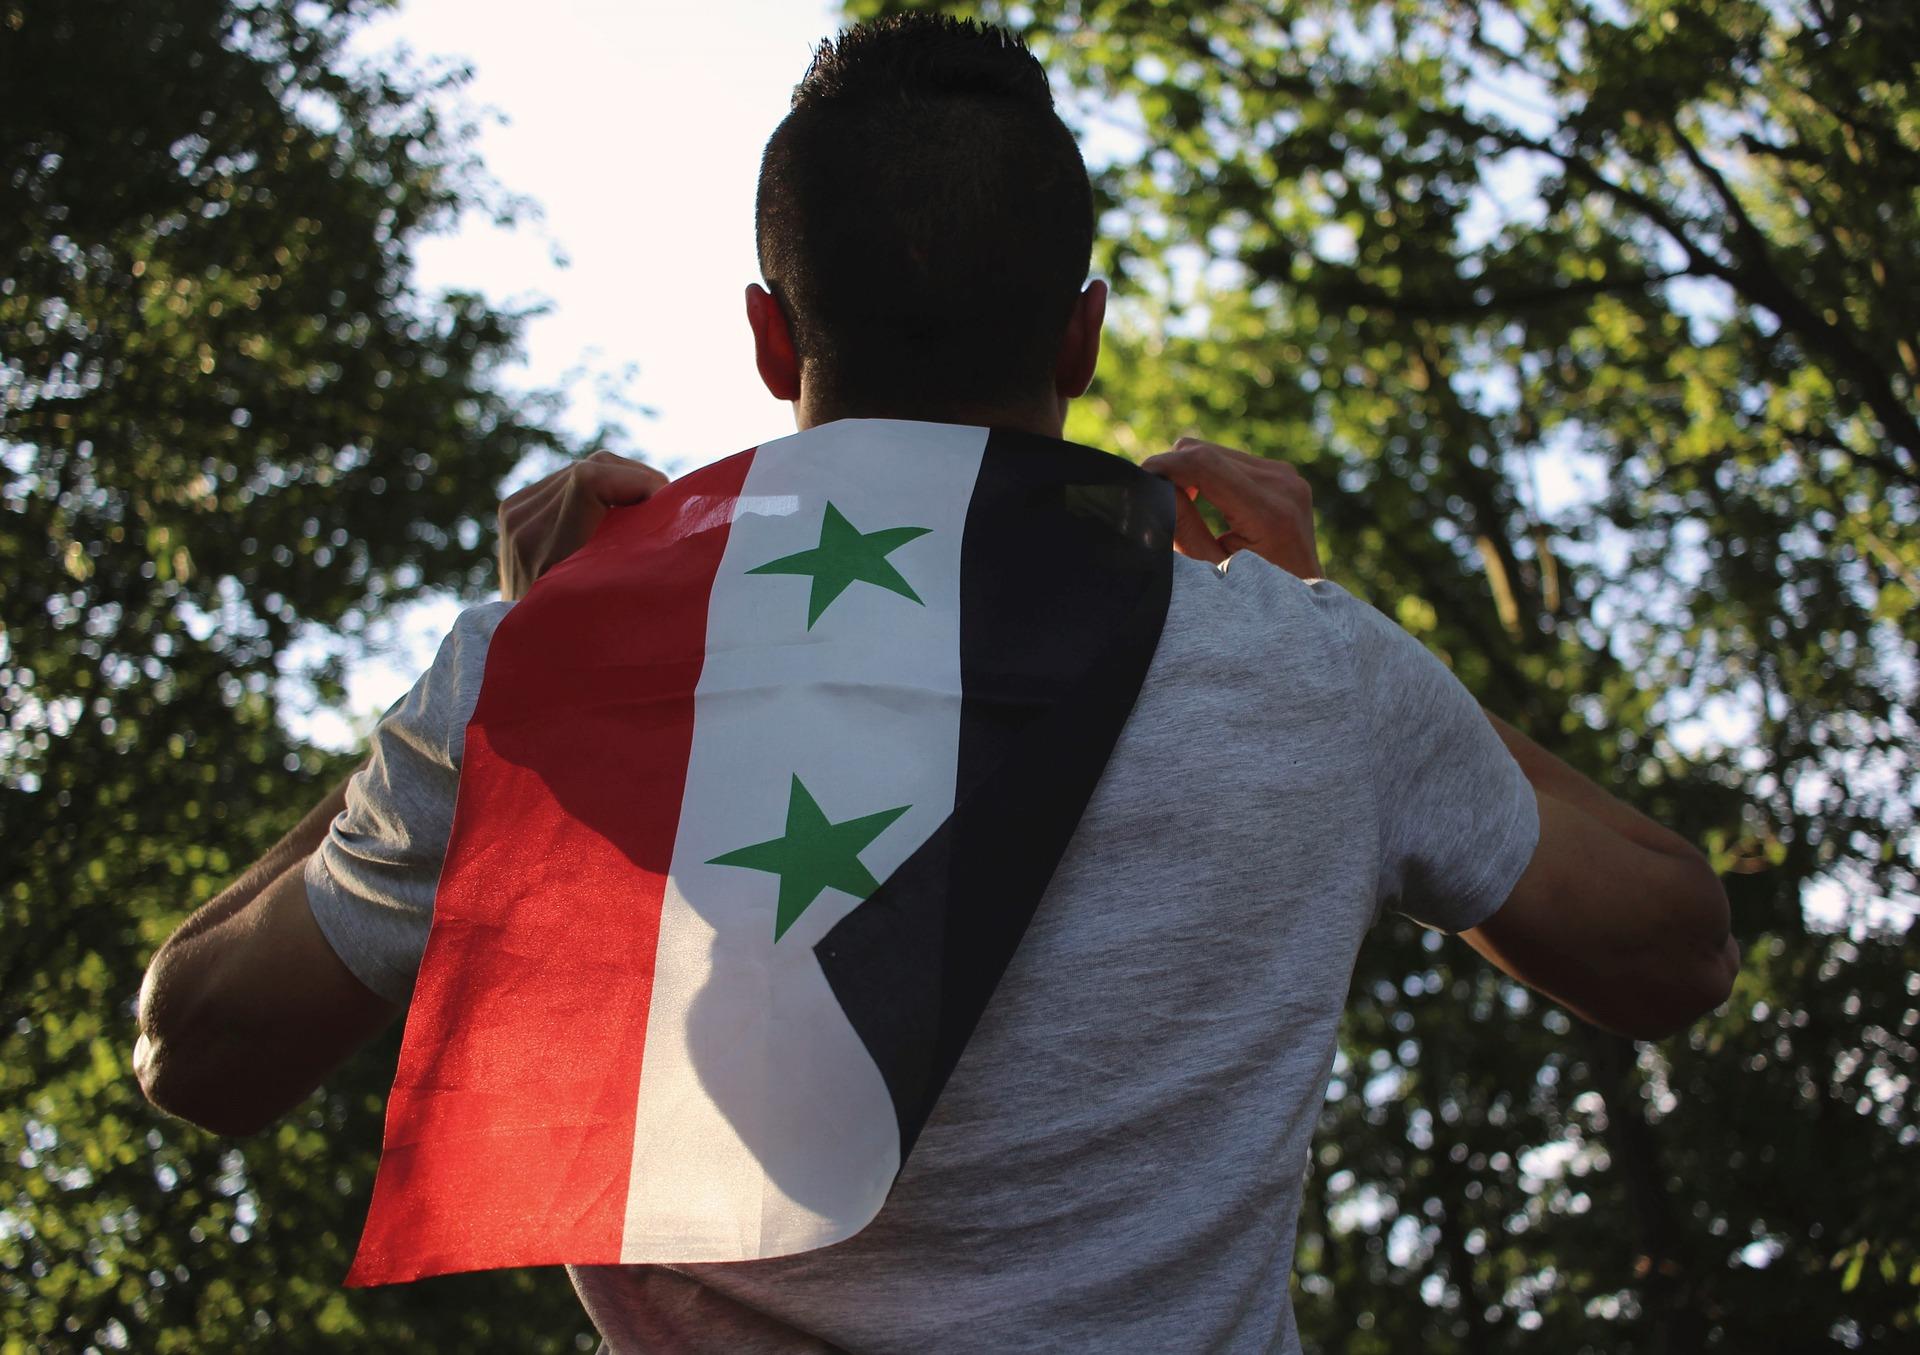 Syria faces triple threat: coronavirus, food crisis, and Islamic State